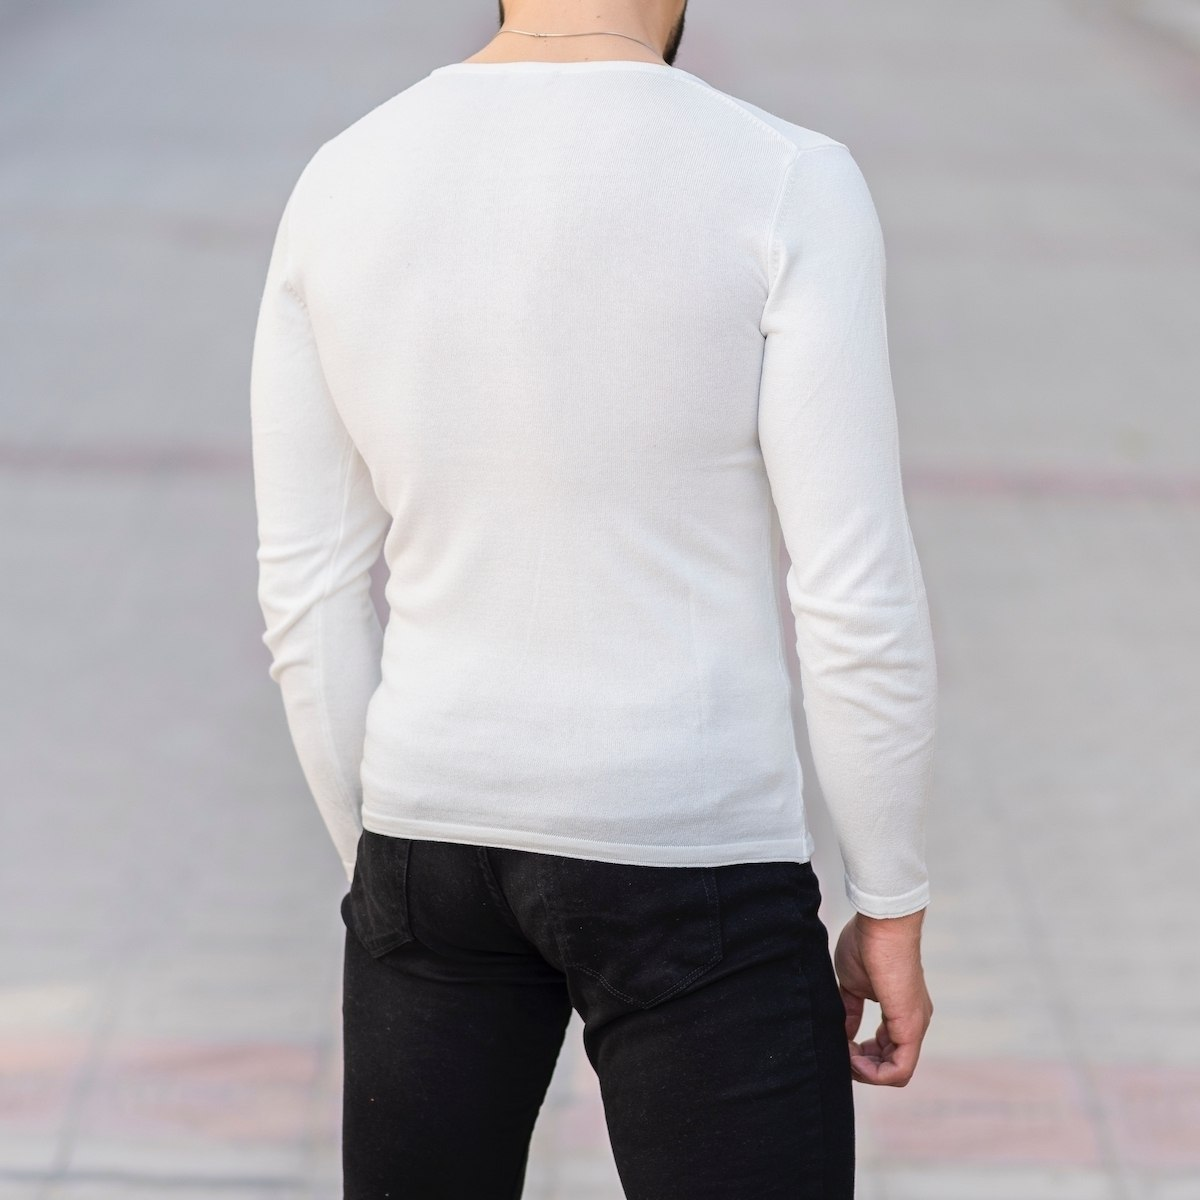 Slim-Fitting Classic Round-Neck Sweater in White Mv Premium Brand - 5